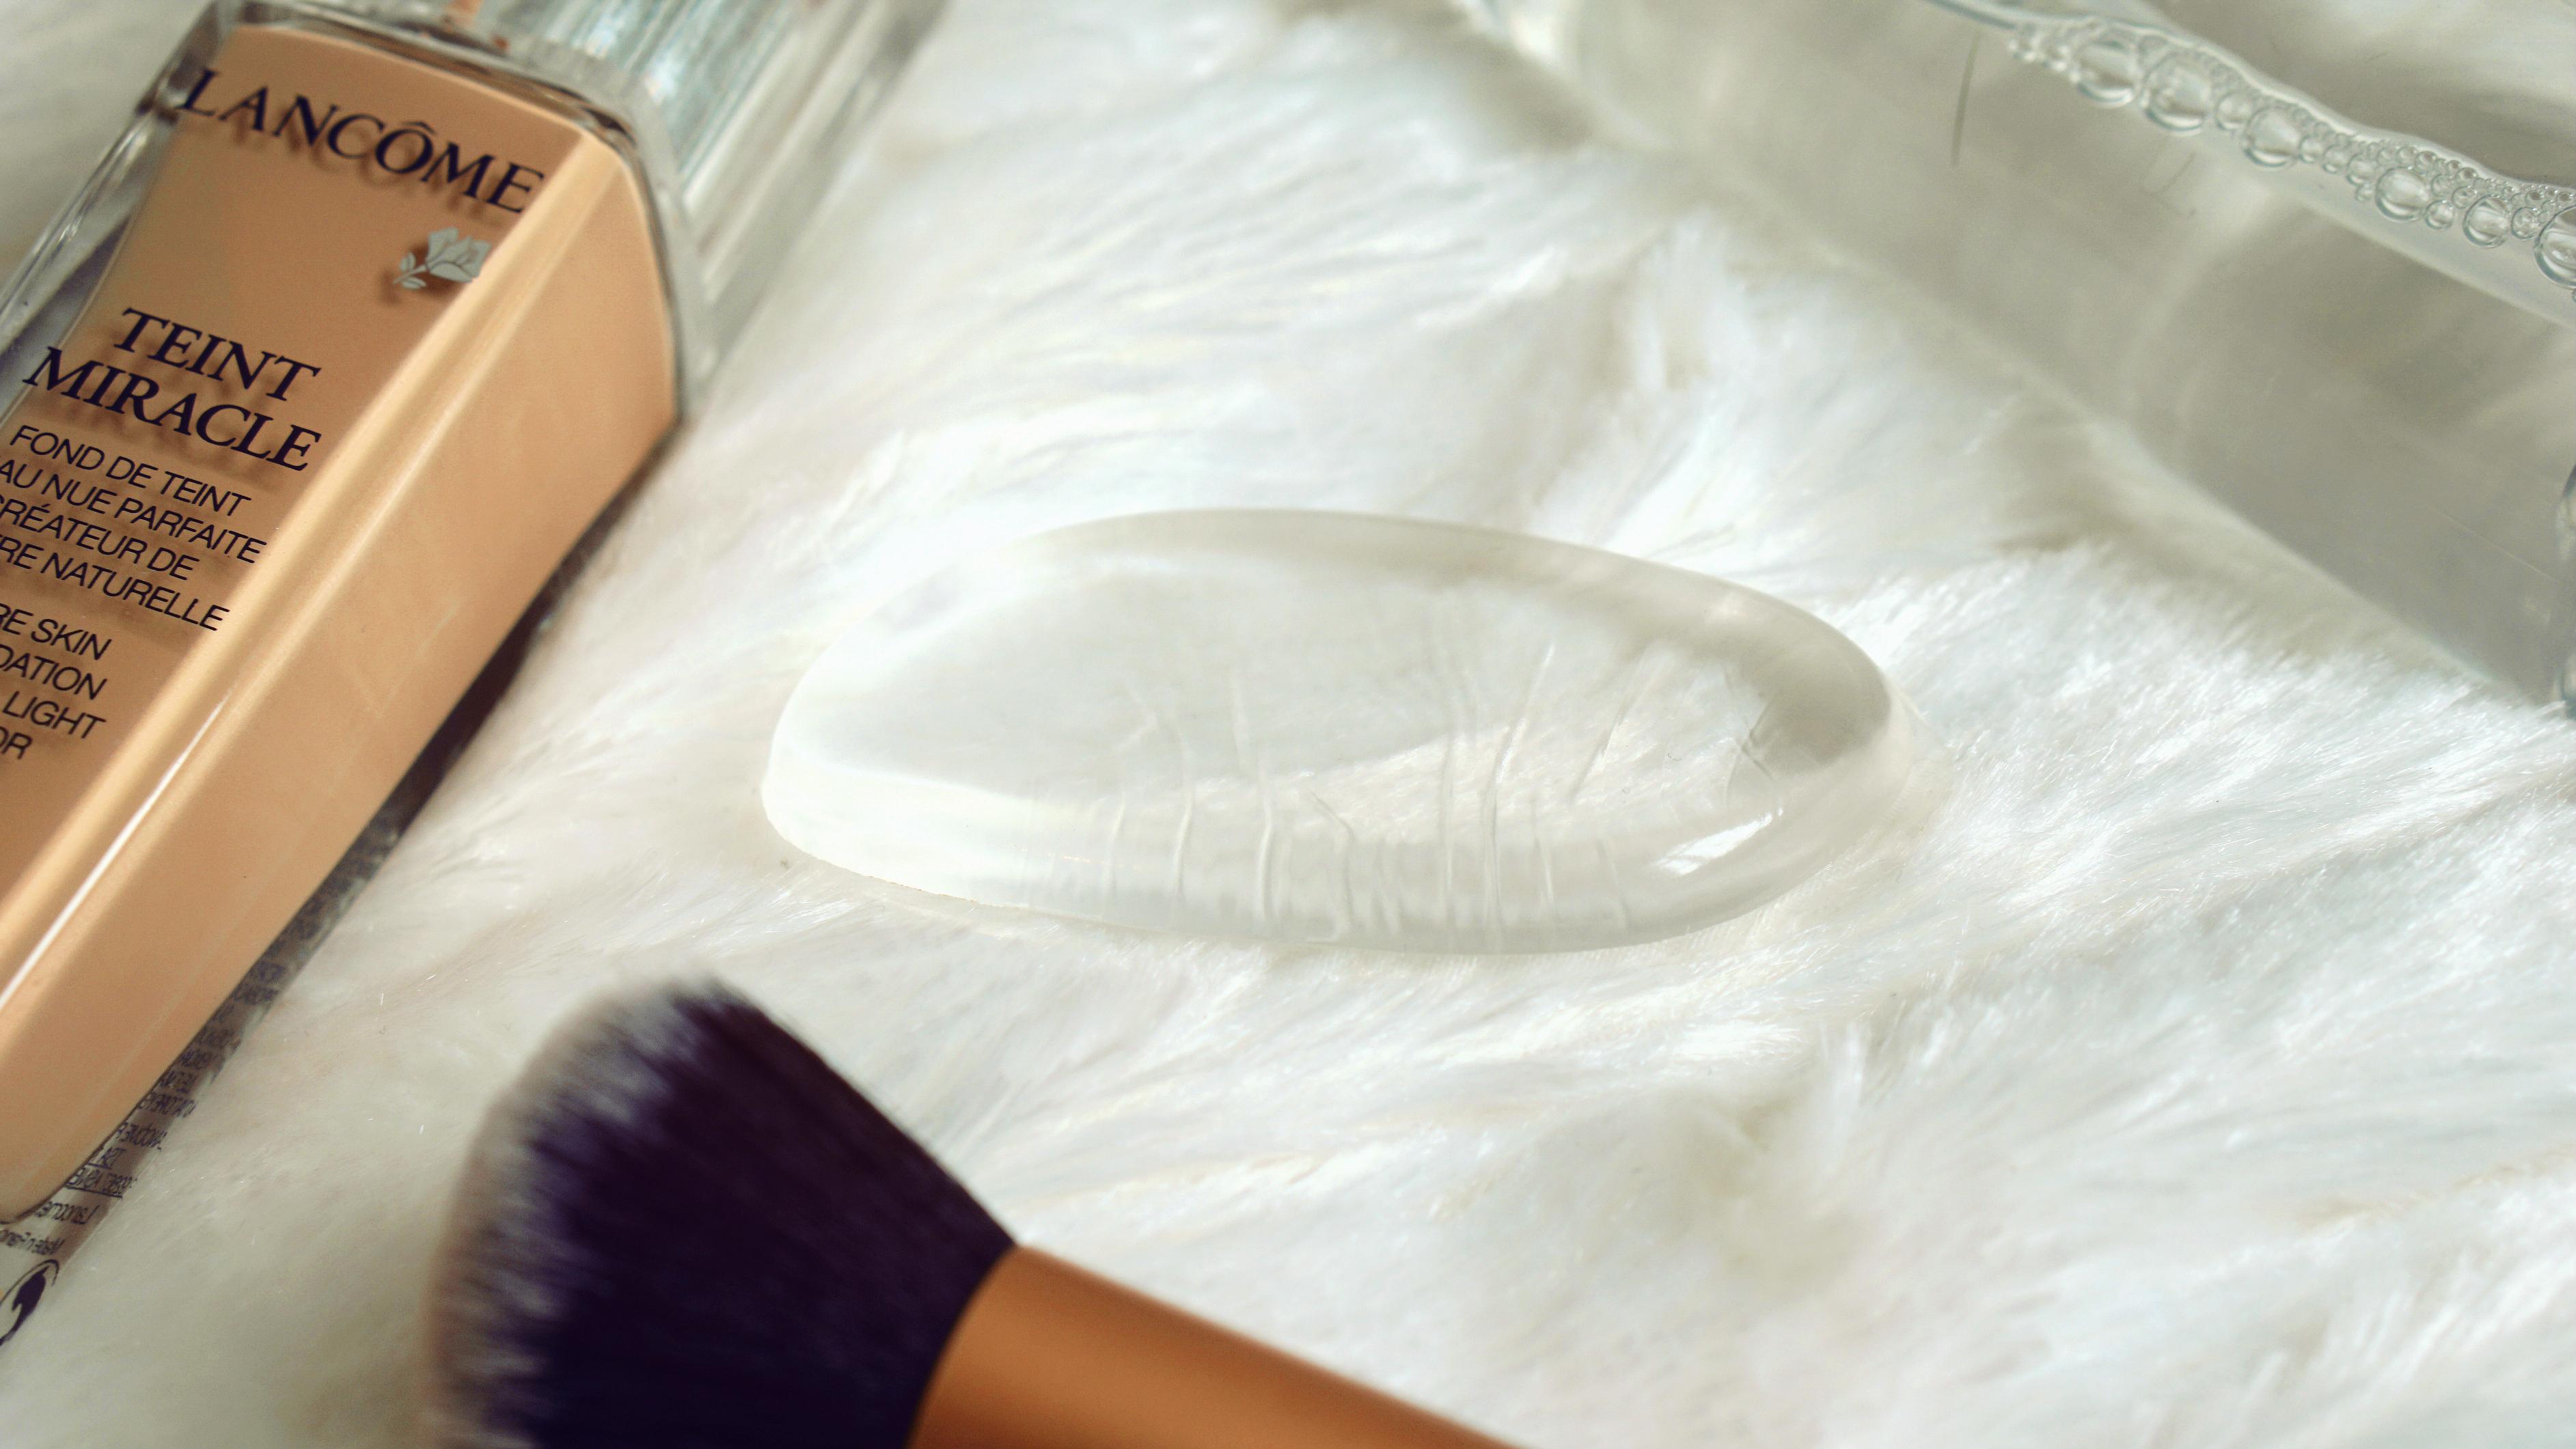 silisponge silidrop eponge silicone